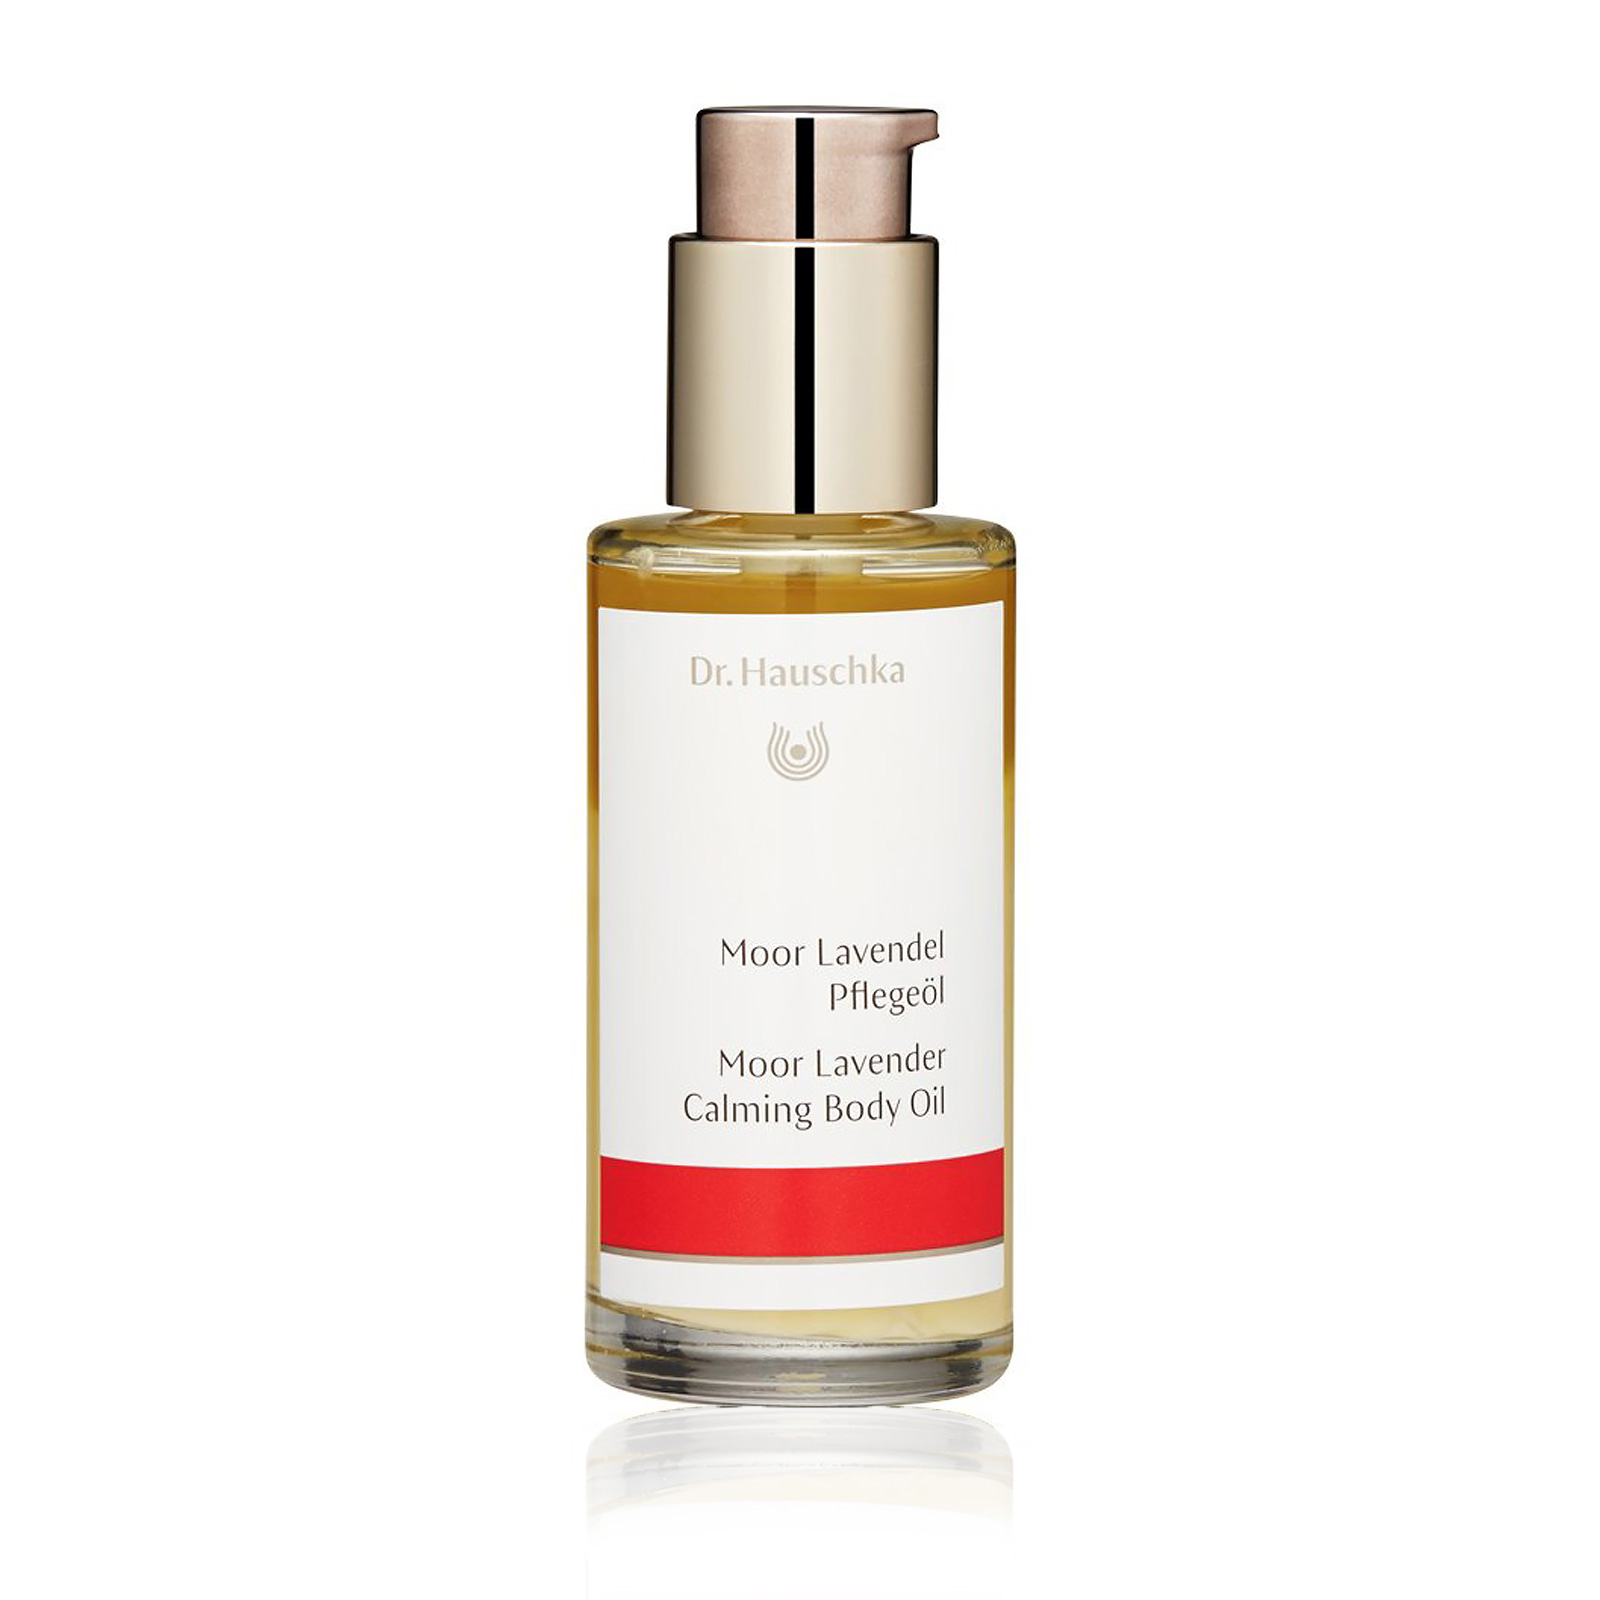 Moor Lavender Calming Body Oil